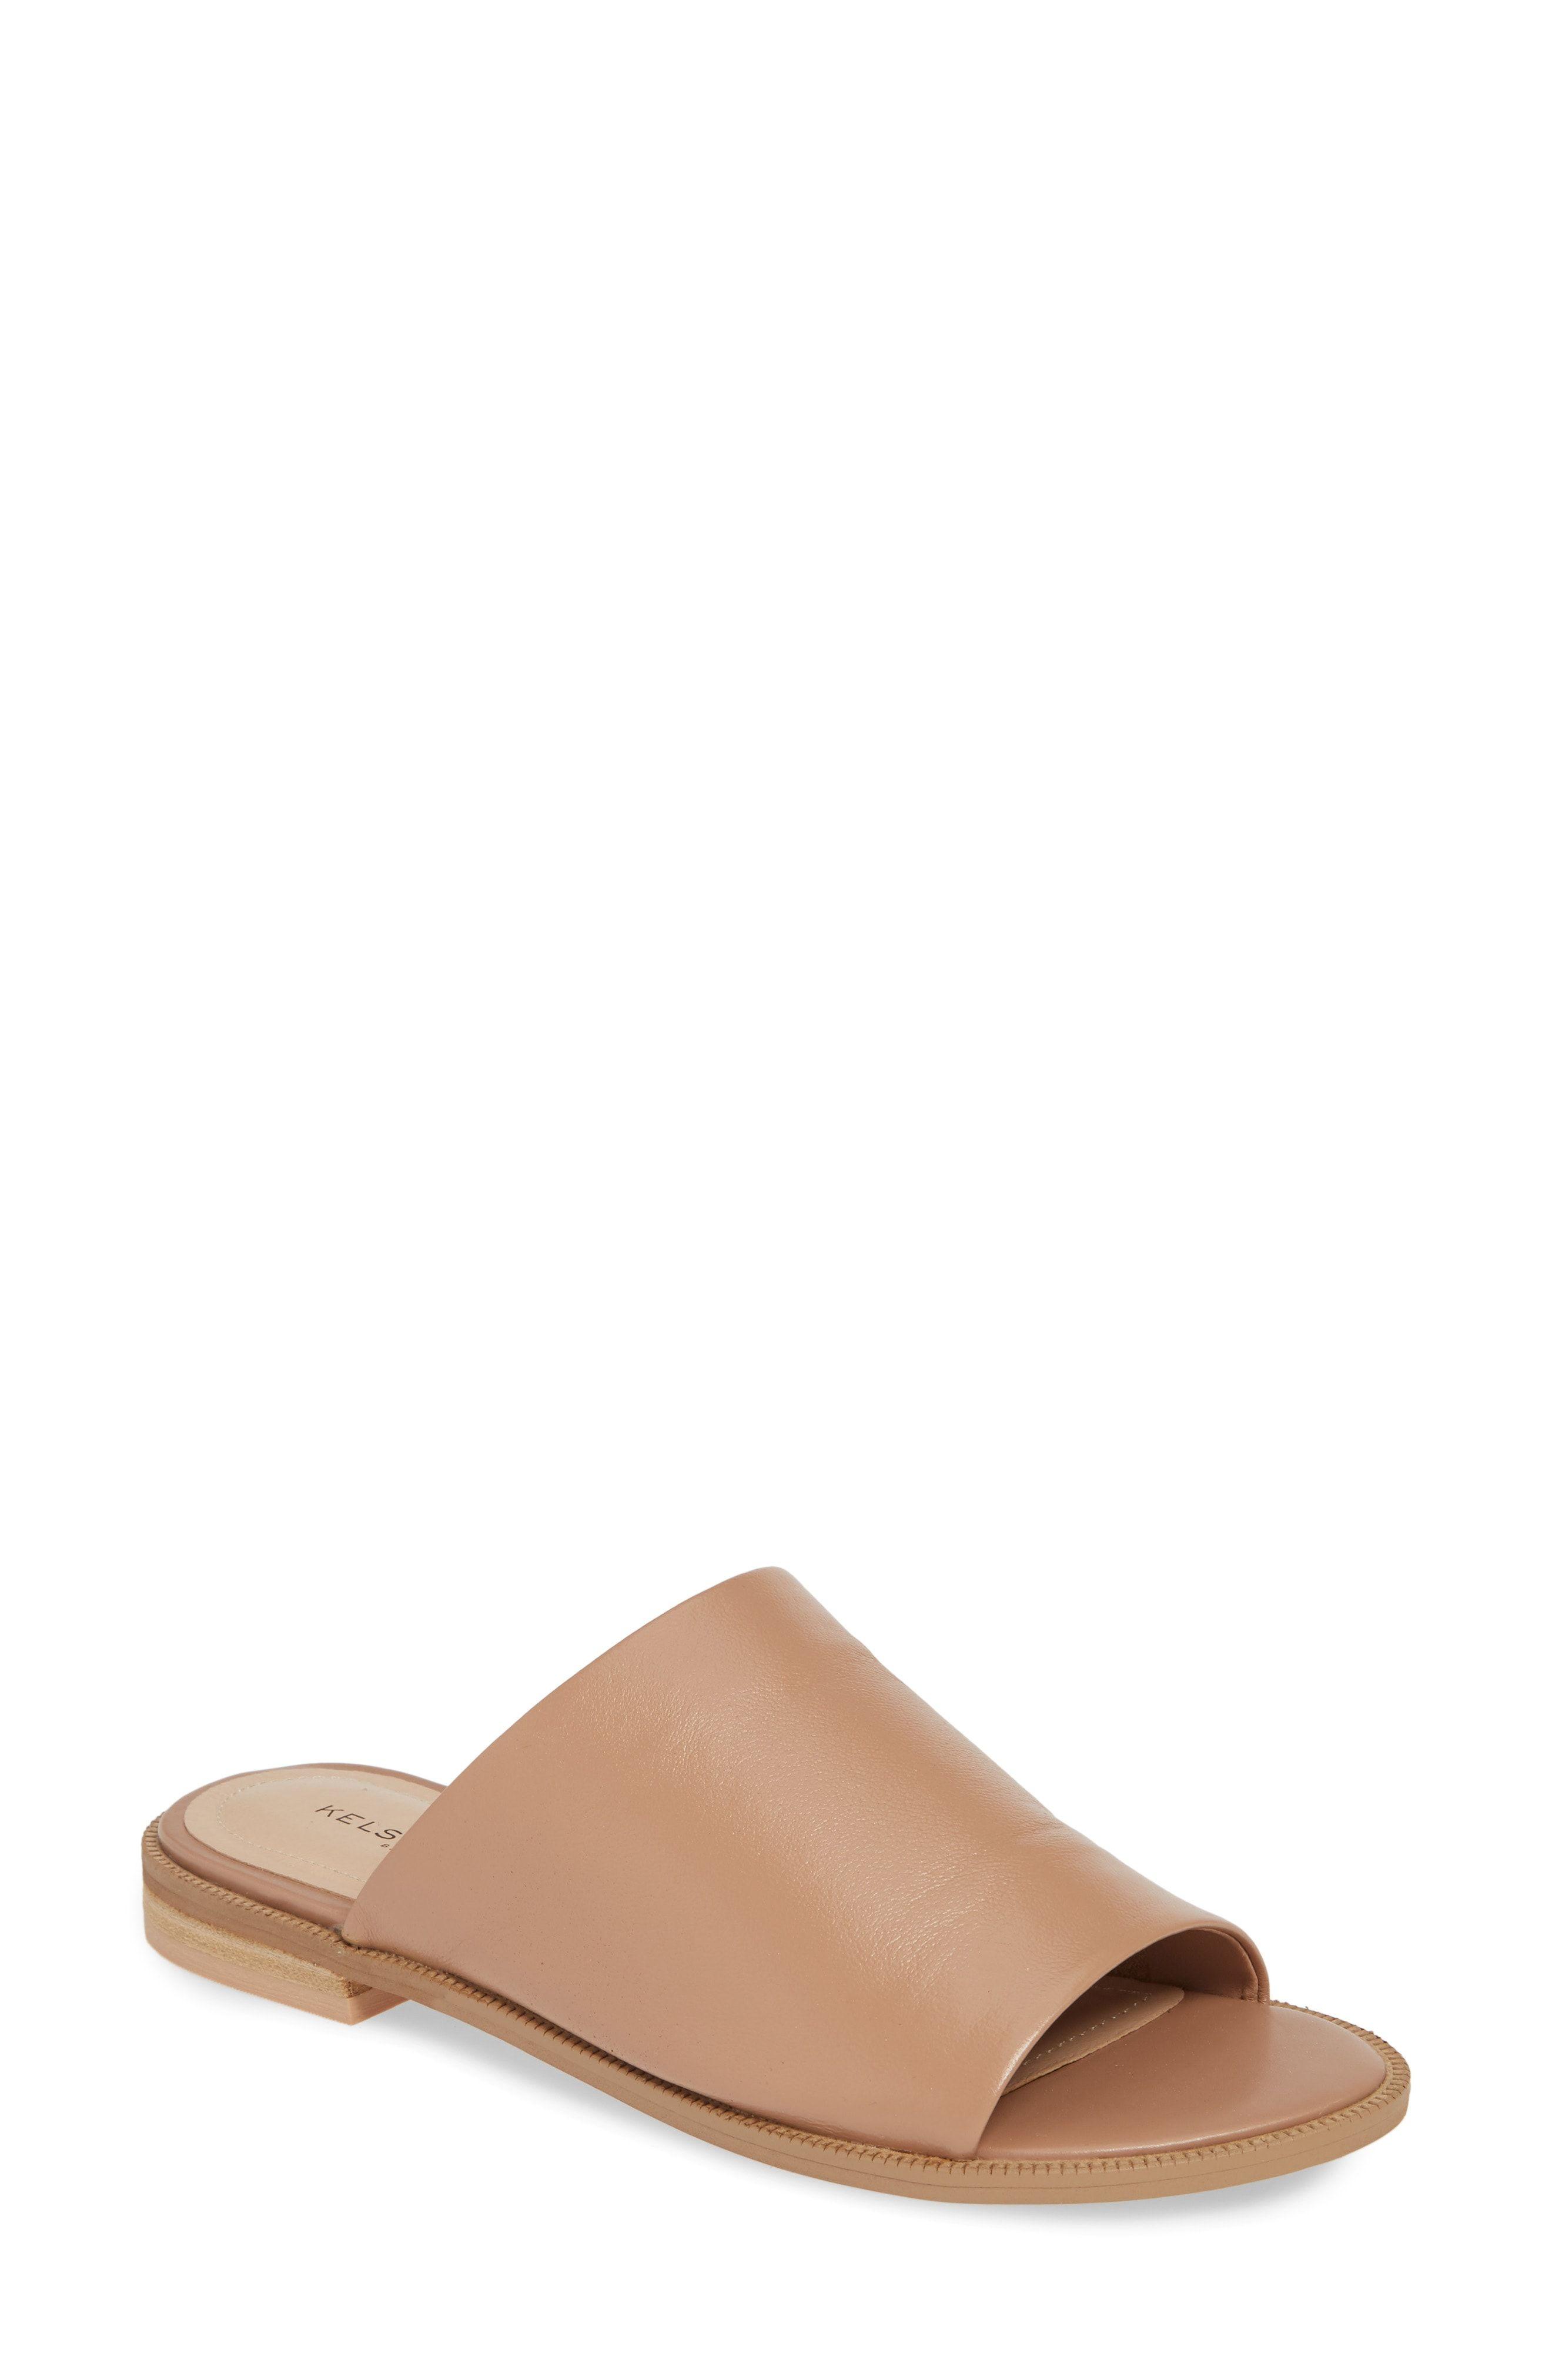 78a6fa6de0c2 KELSI DAGGER BROOKLYN RUTHIE SLIDE SANDAL.  kelsidaggerbrooklyn  shoes